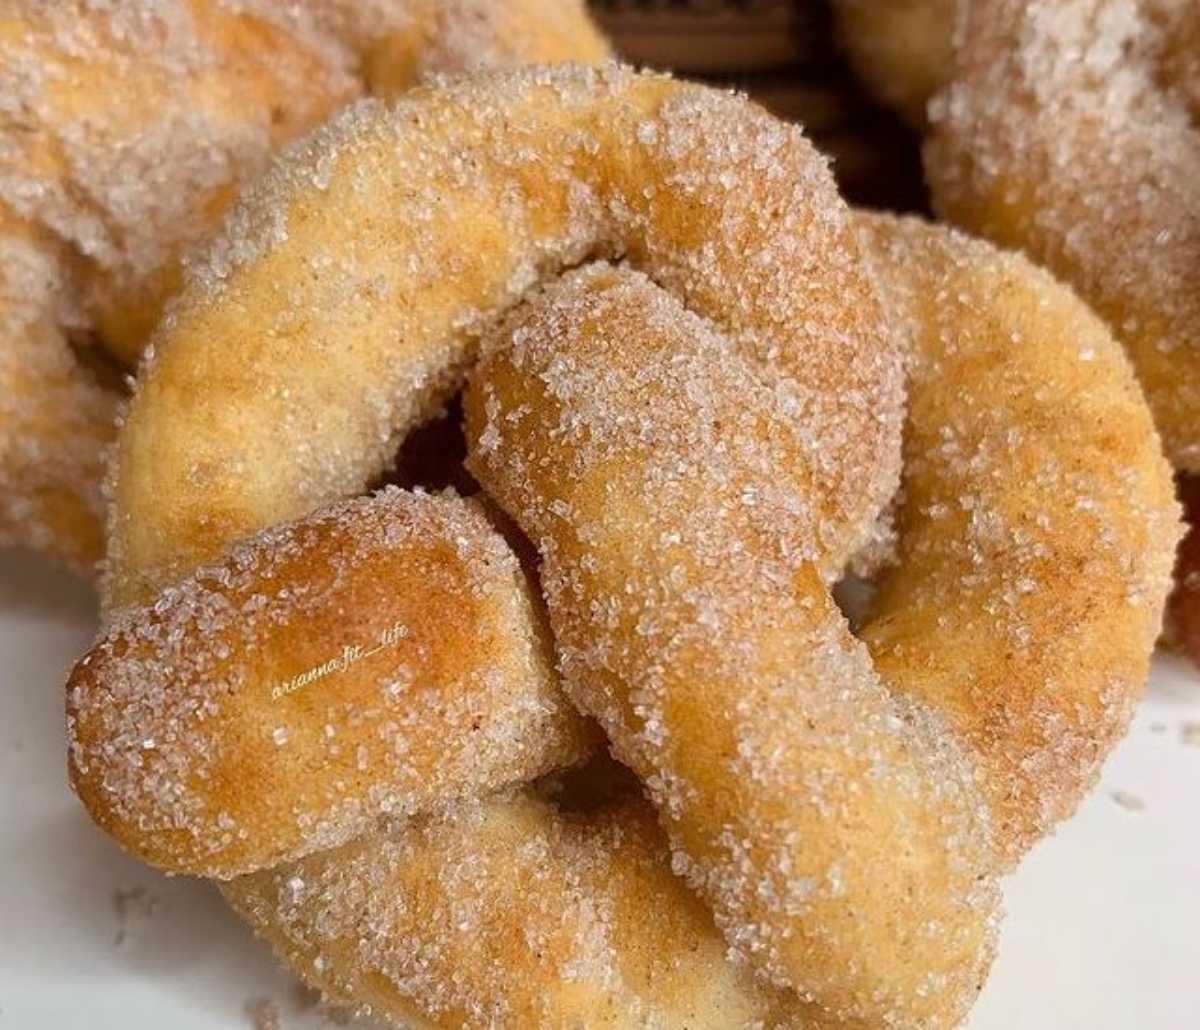 Pretzel dolci senza zucchero: la versione sana e gustosa!